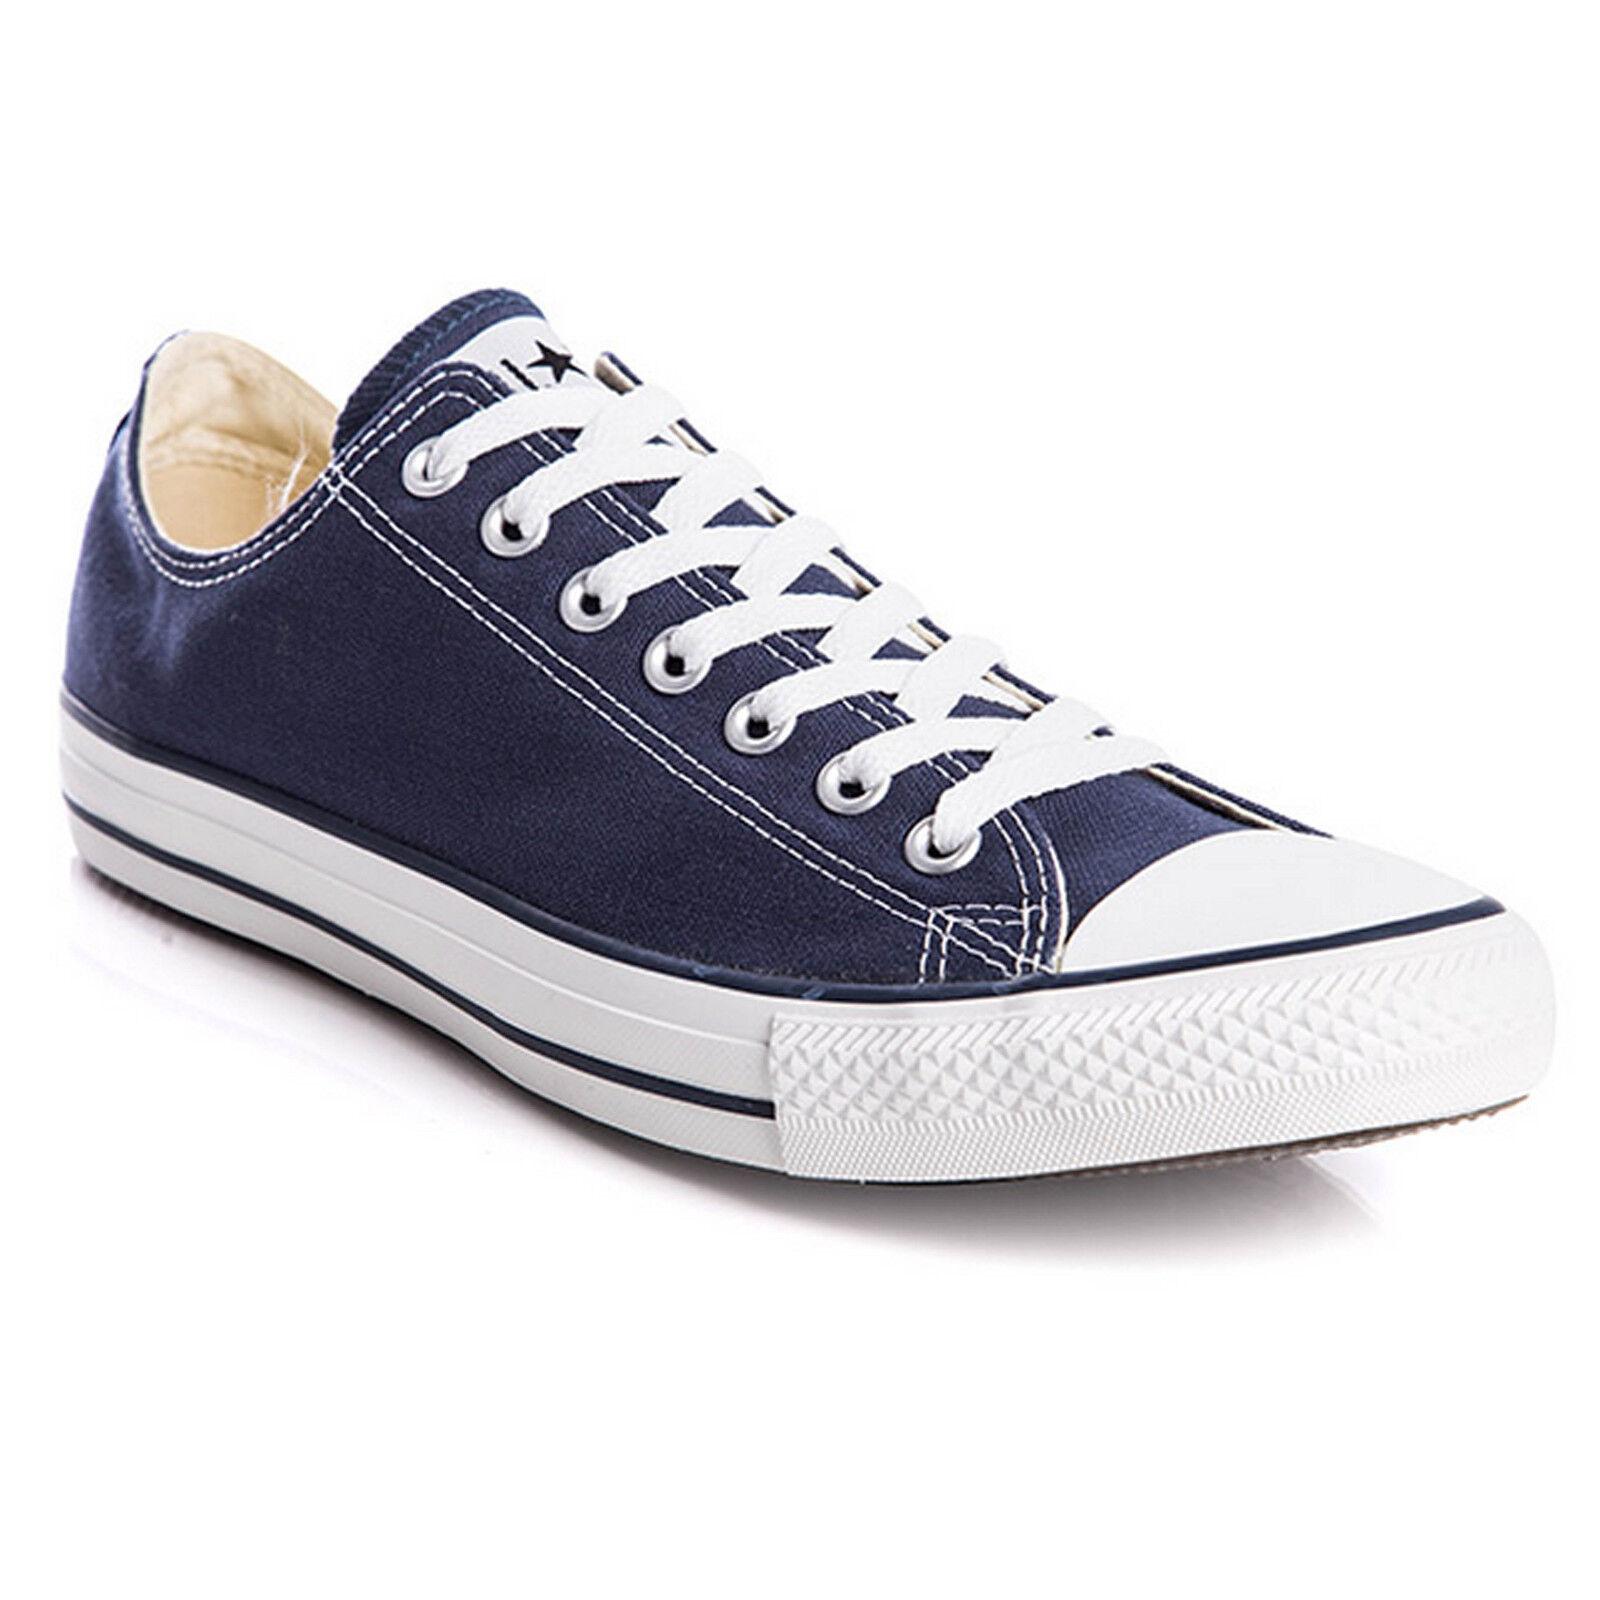 CONVERSE CT All Star Star All Canvas Men Damens Unisex Niedrig-Top Casual Sneaker Schuhes c83273